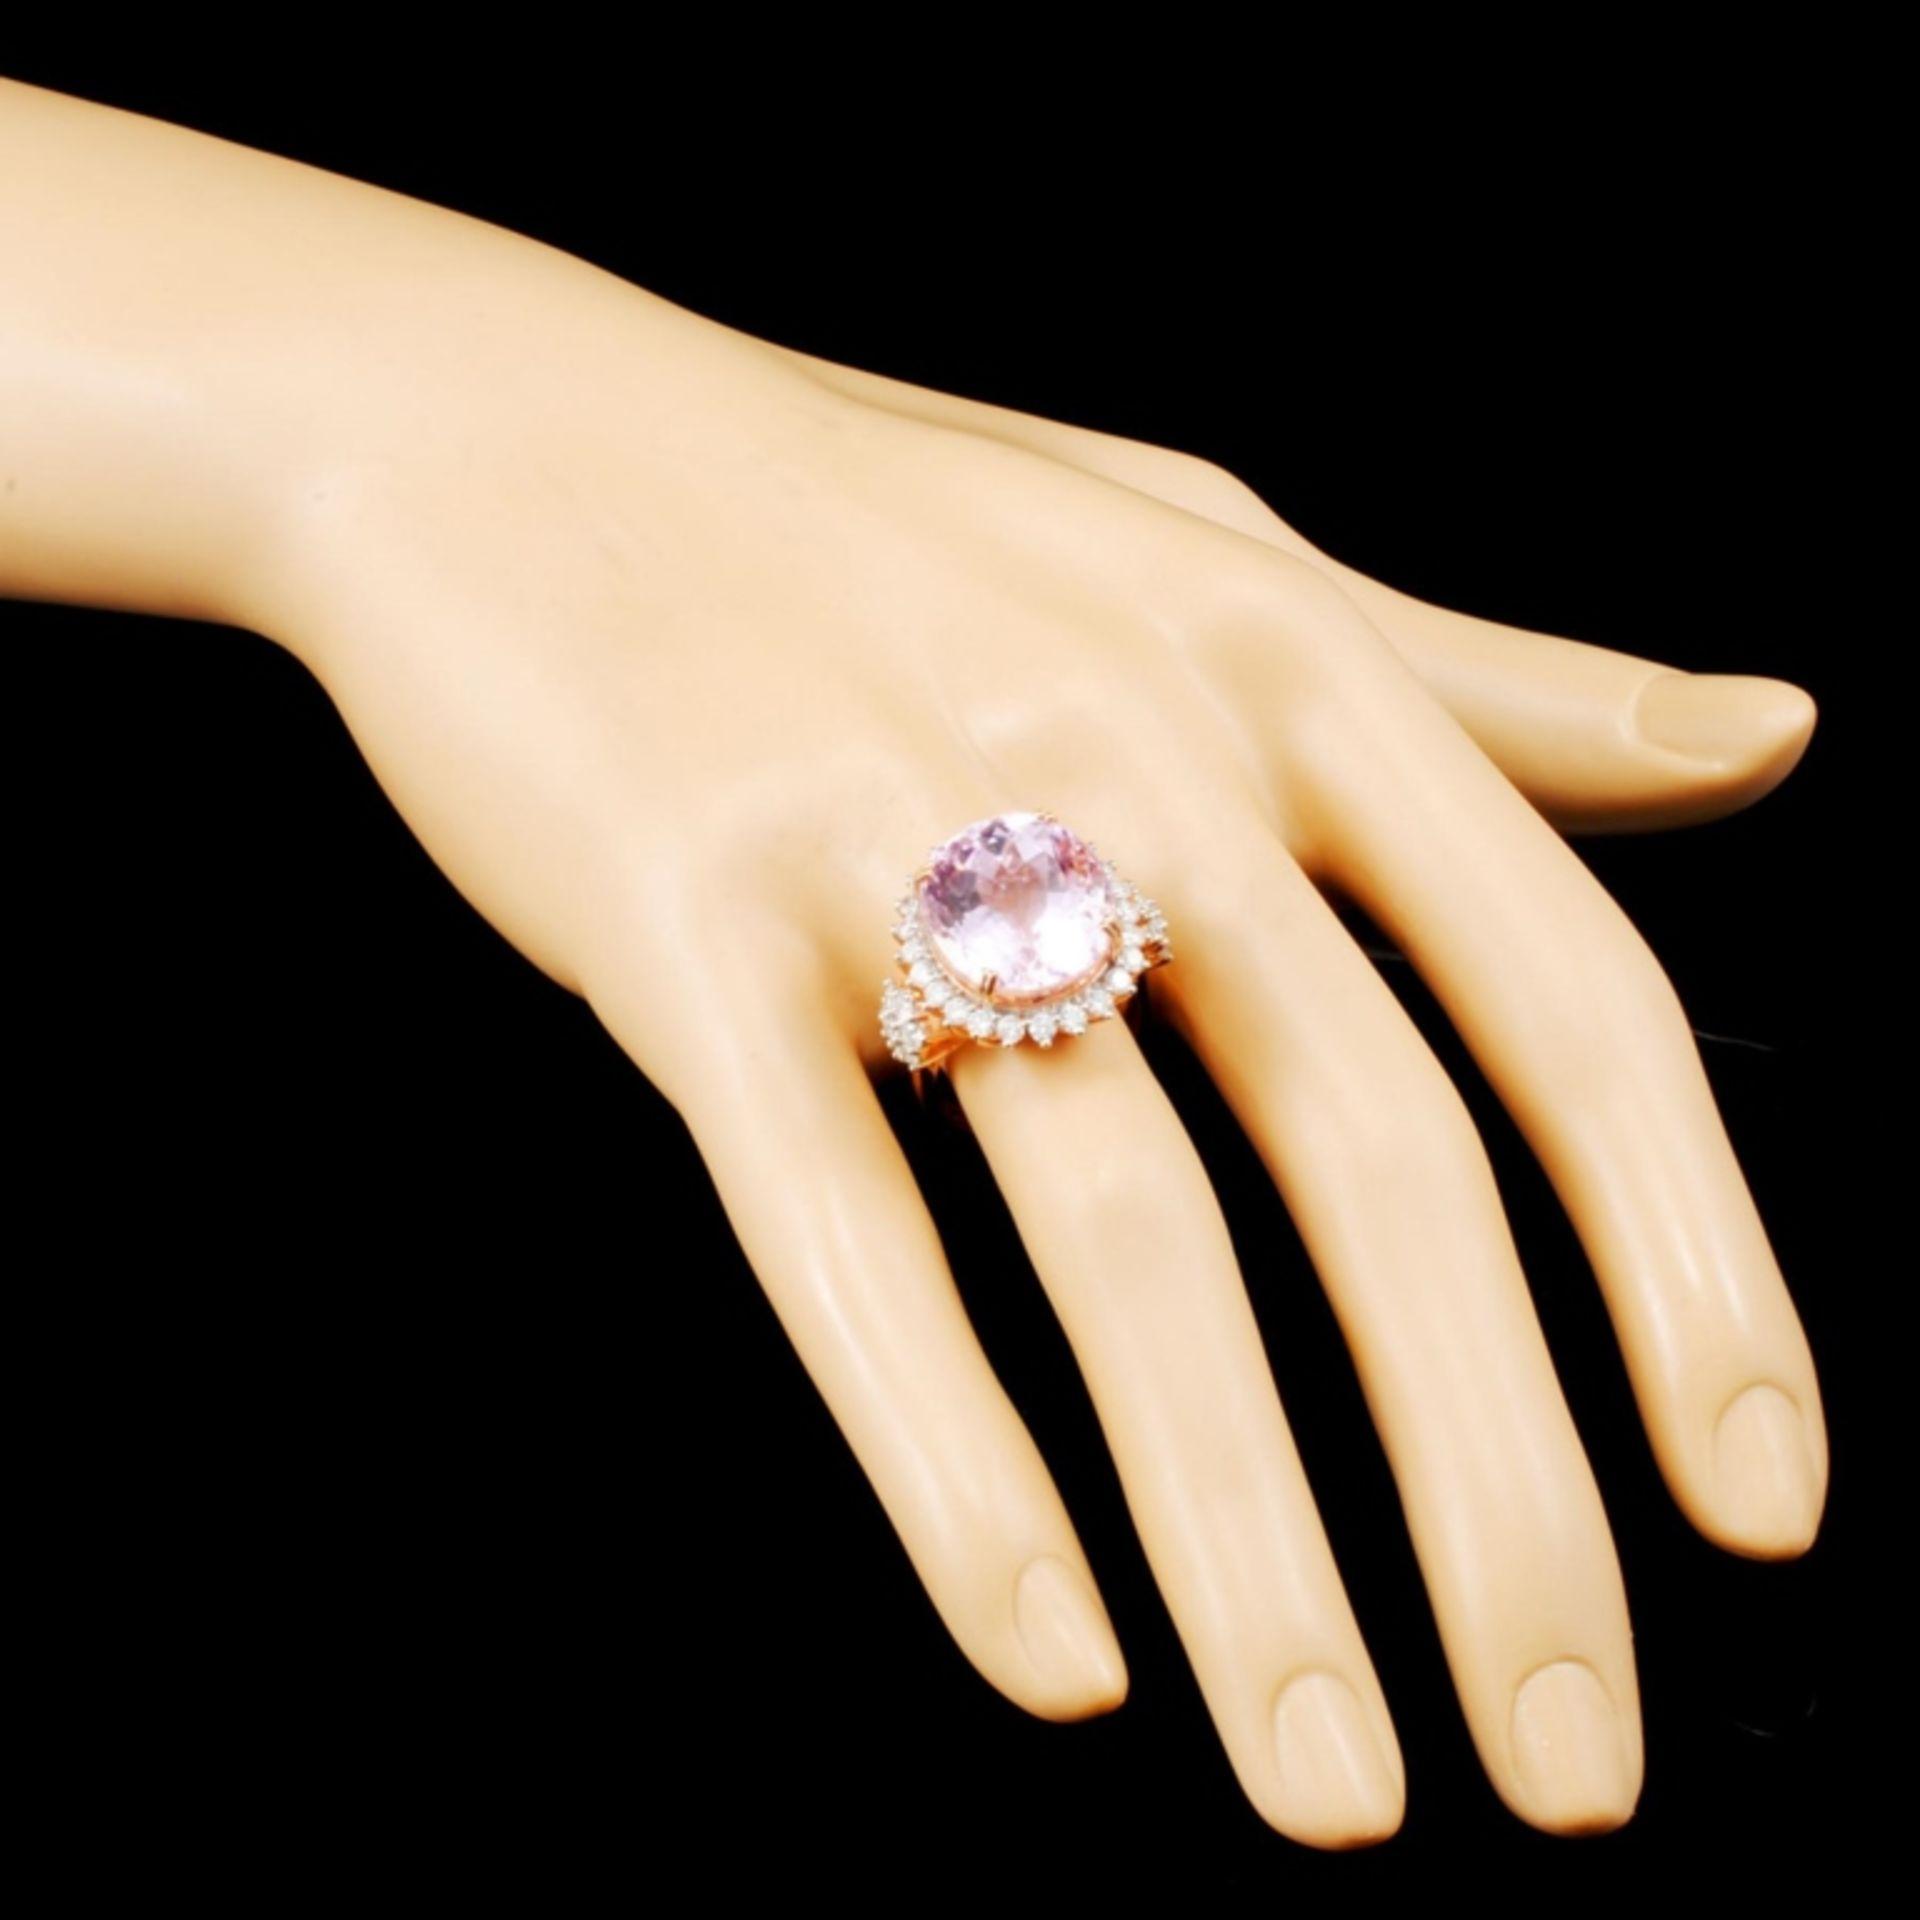 14K Gold 17.00ct Kunzite & 1.32ctw Diamond Ring - Image 3 of 5